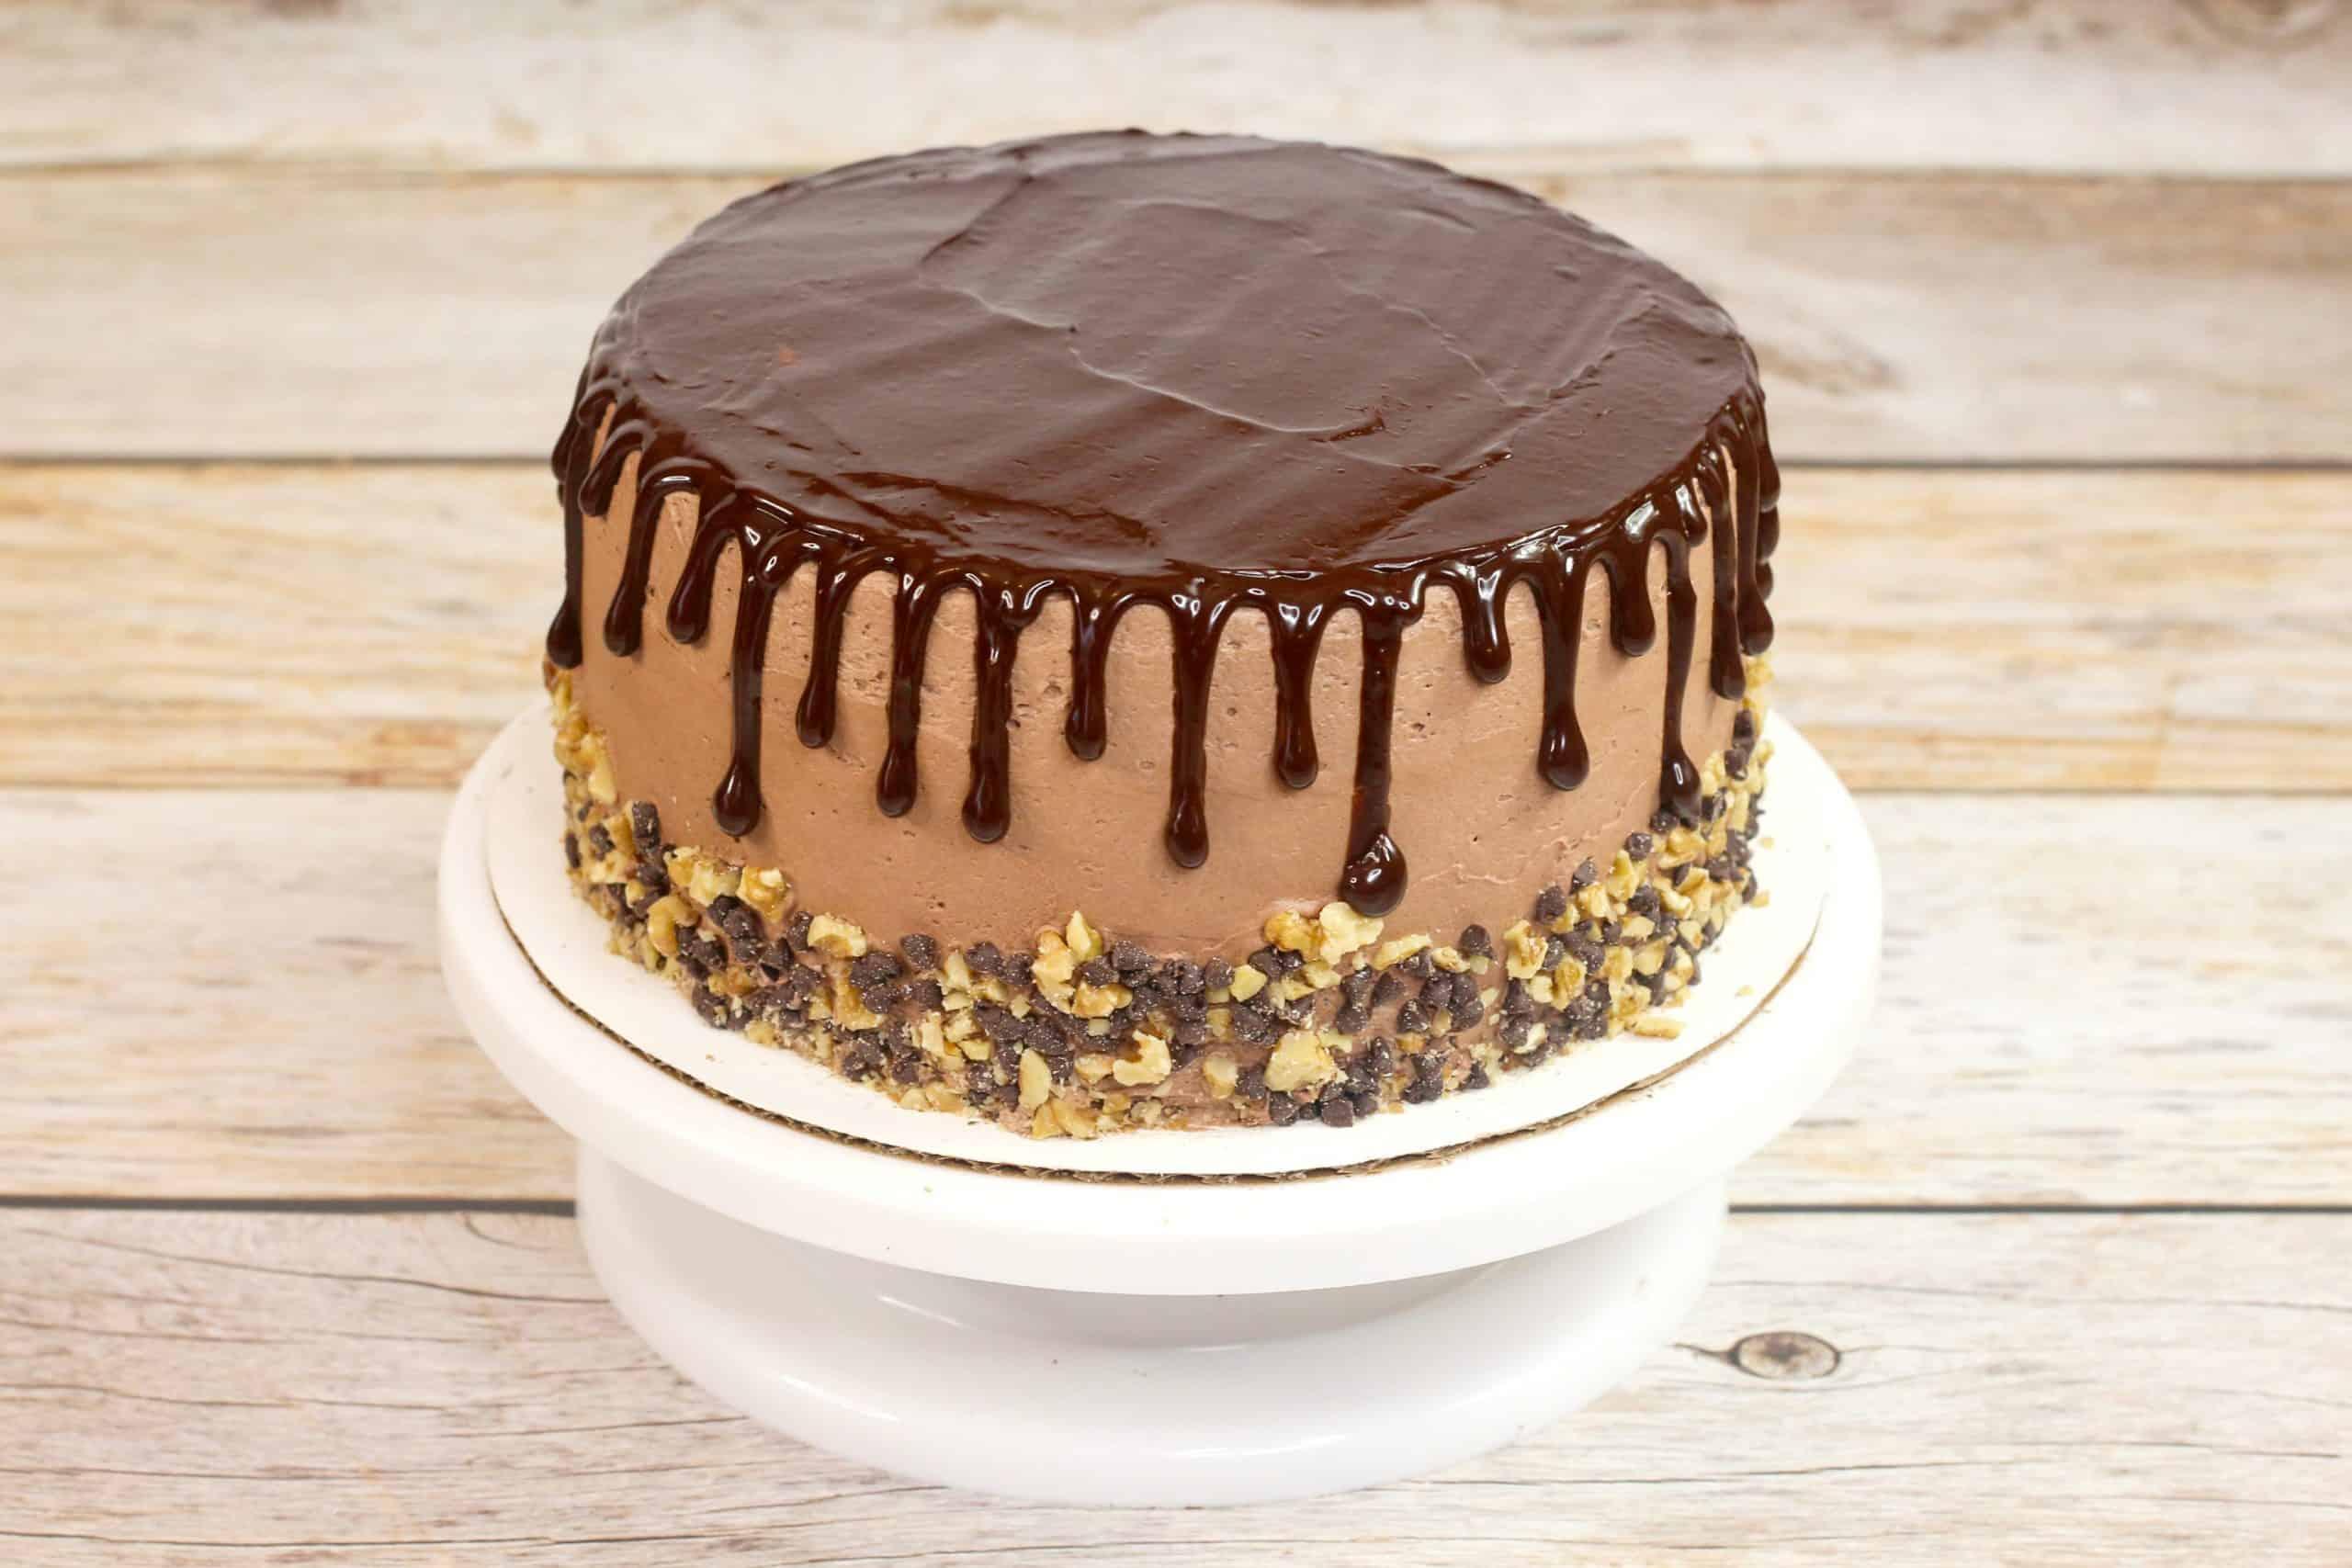 chocolate fudge cake with ganache